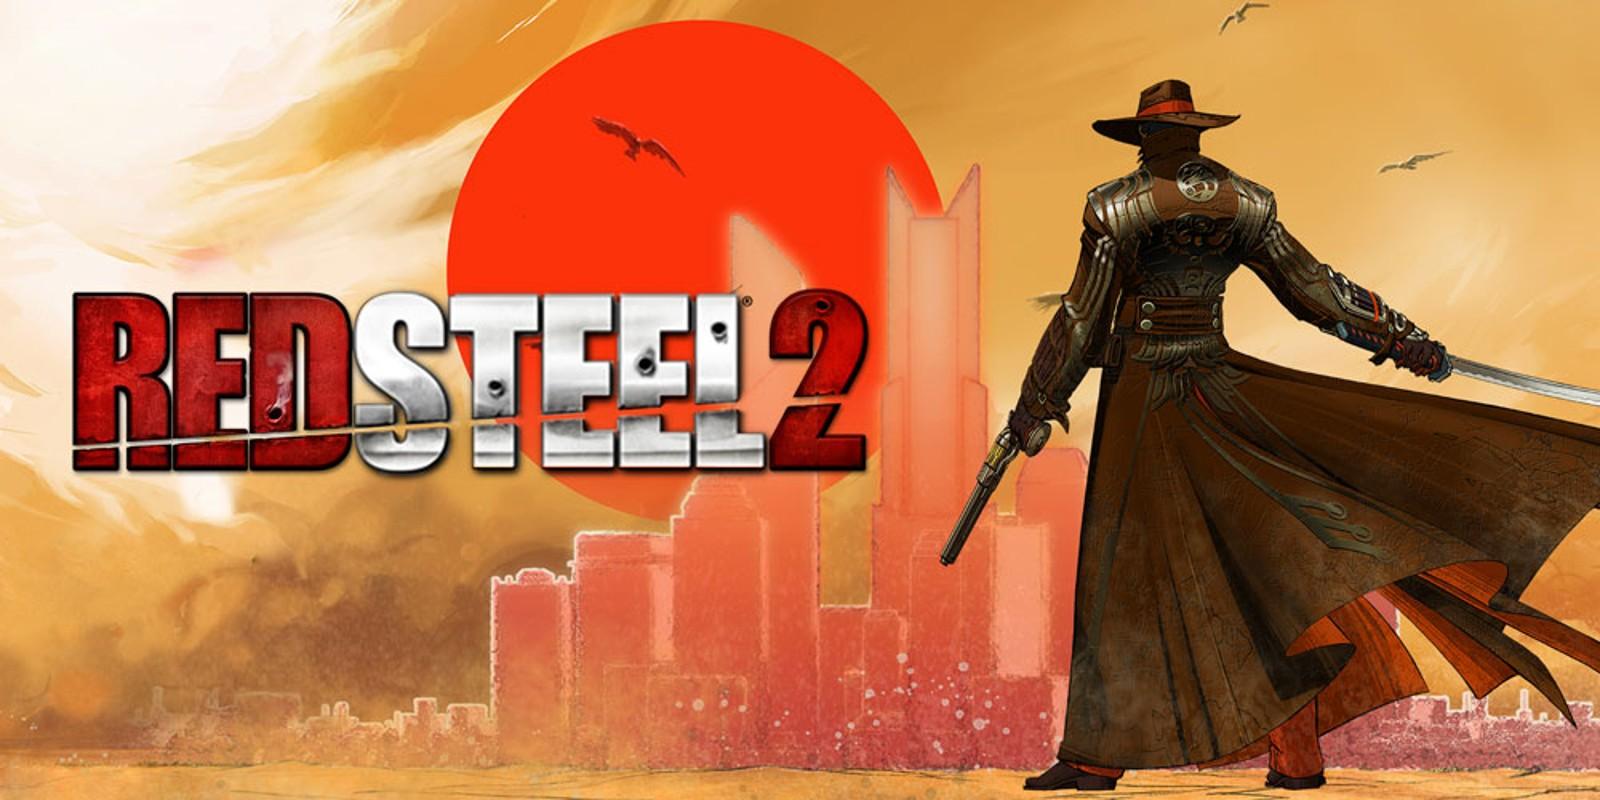 Red Steel 2 Wii Juegos Nintendo